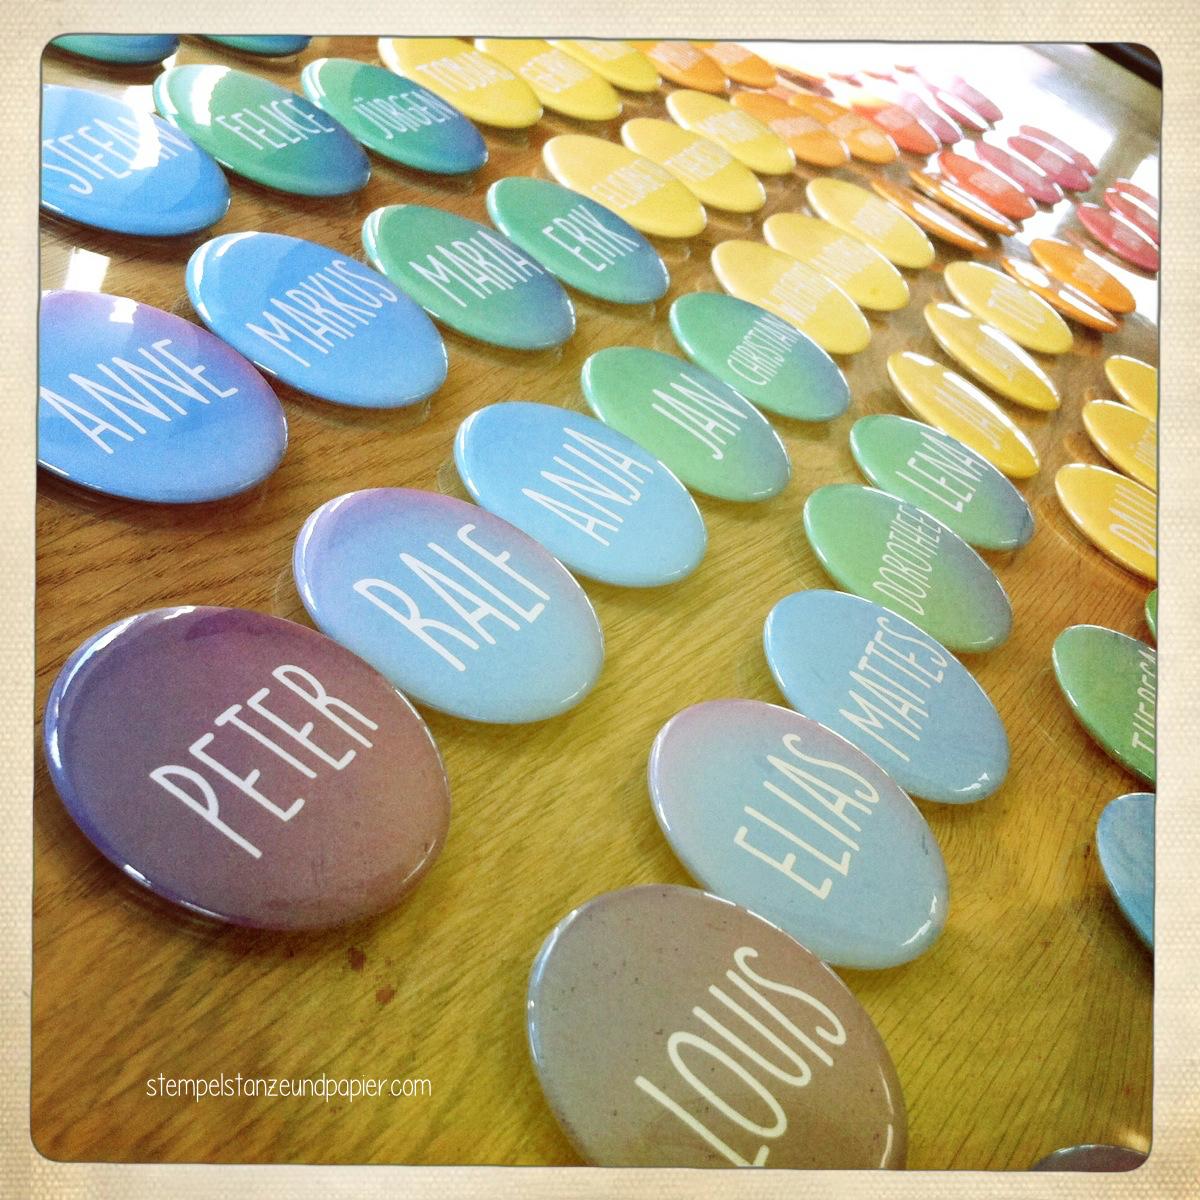 namens buttons familientreffen